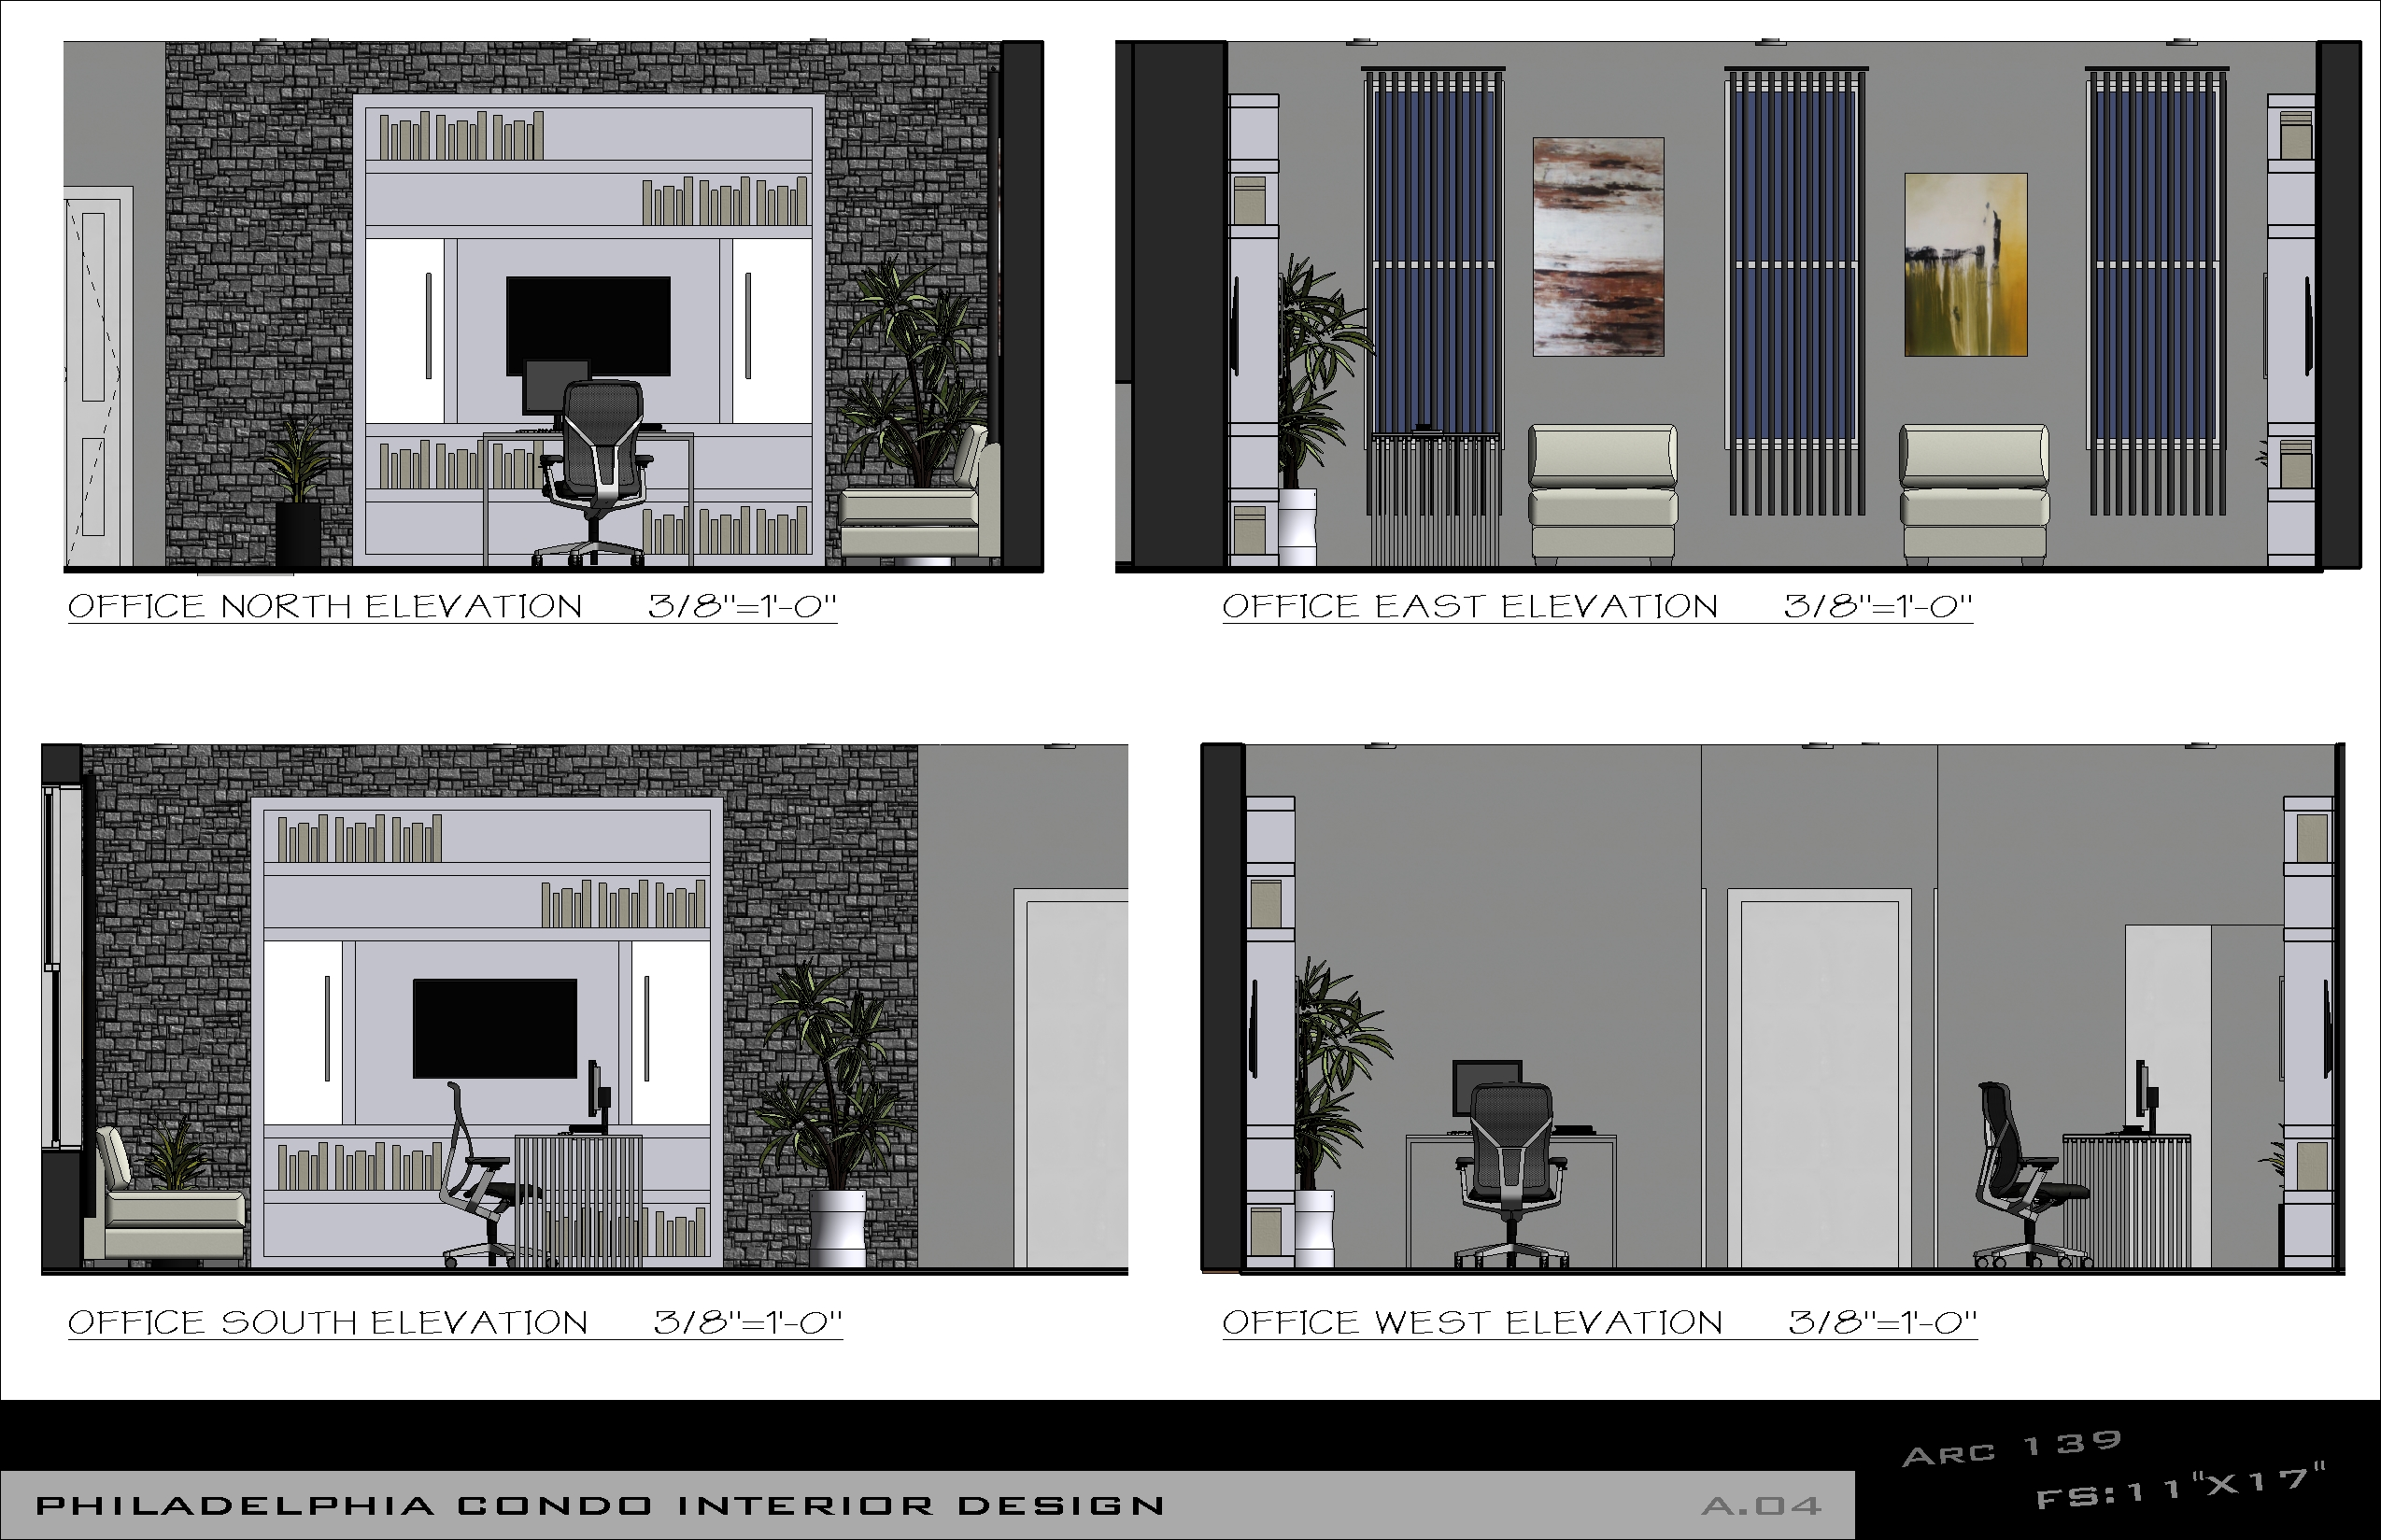 Pin office interior elevations on pinterest for Interior elevation designs